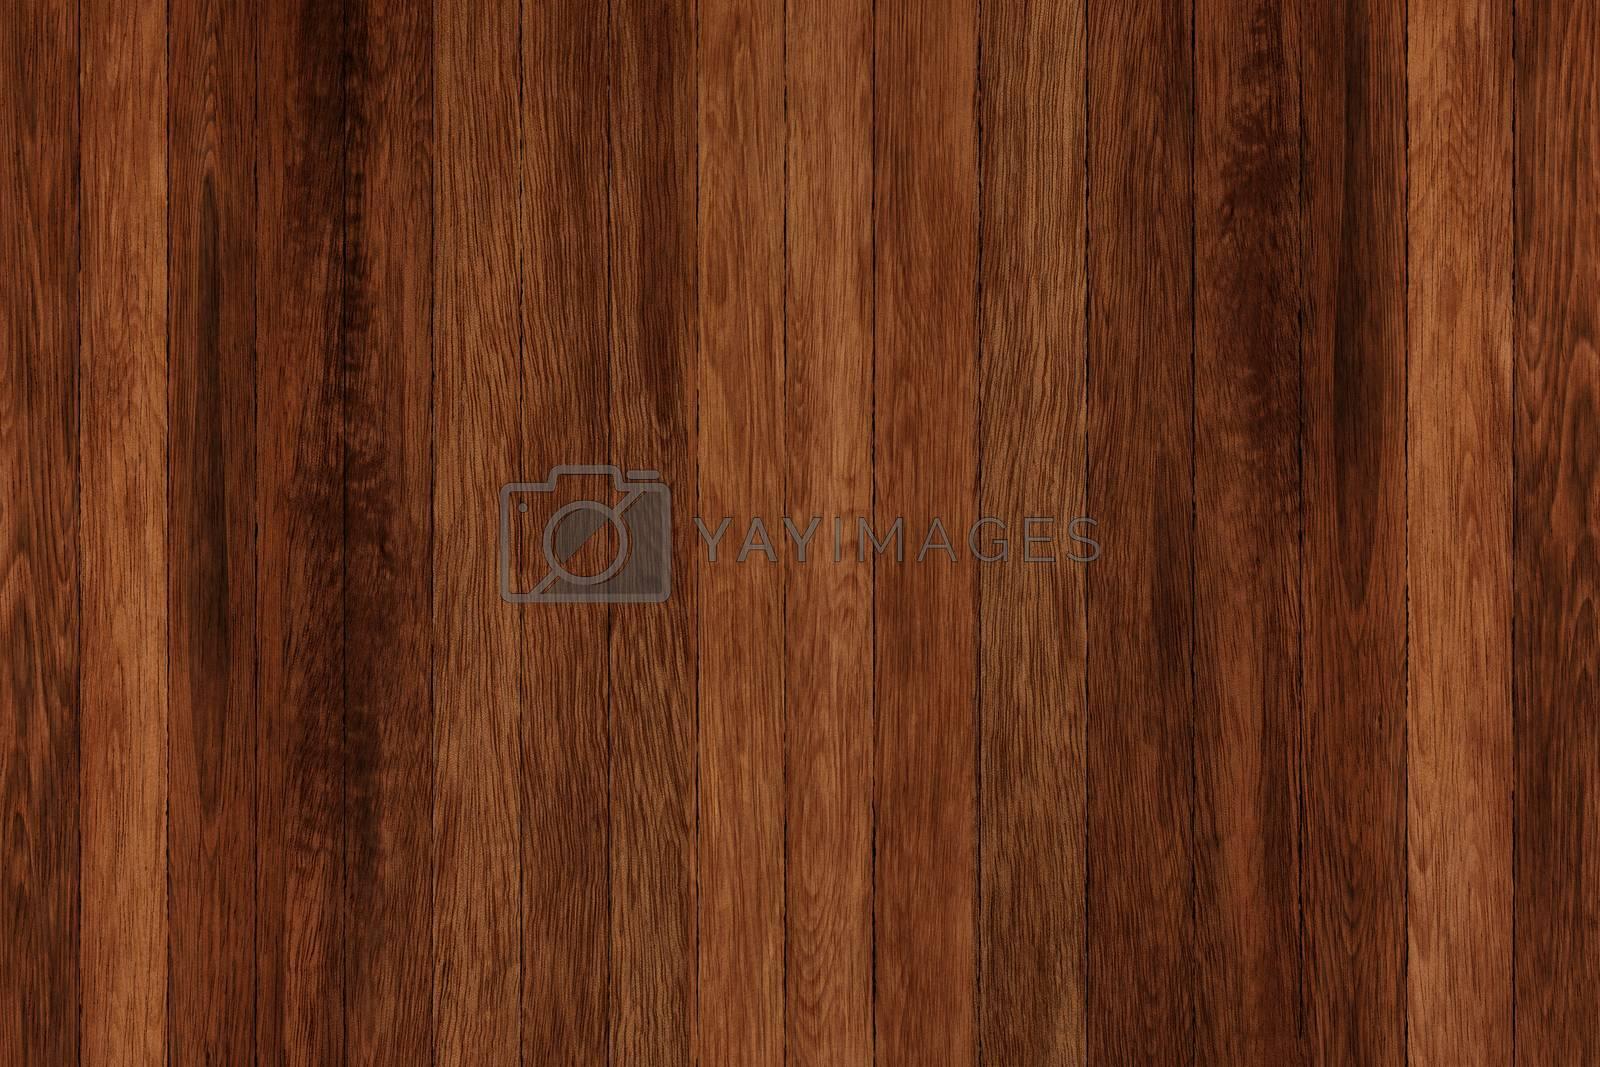 Grunge wood panels. Planks Background. old wall wooden floor vintage